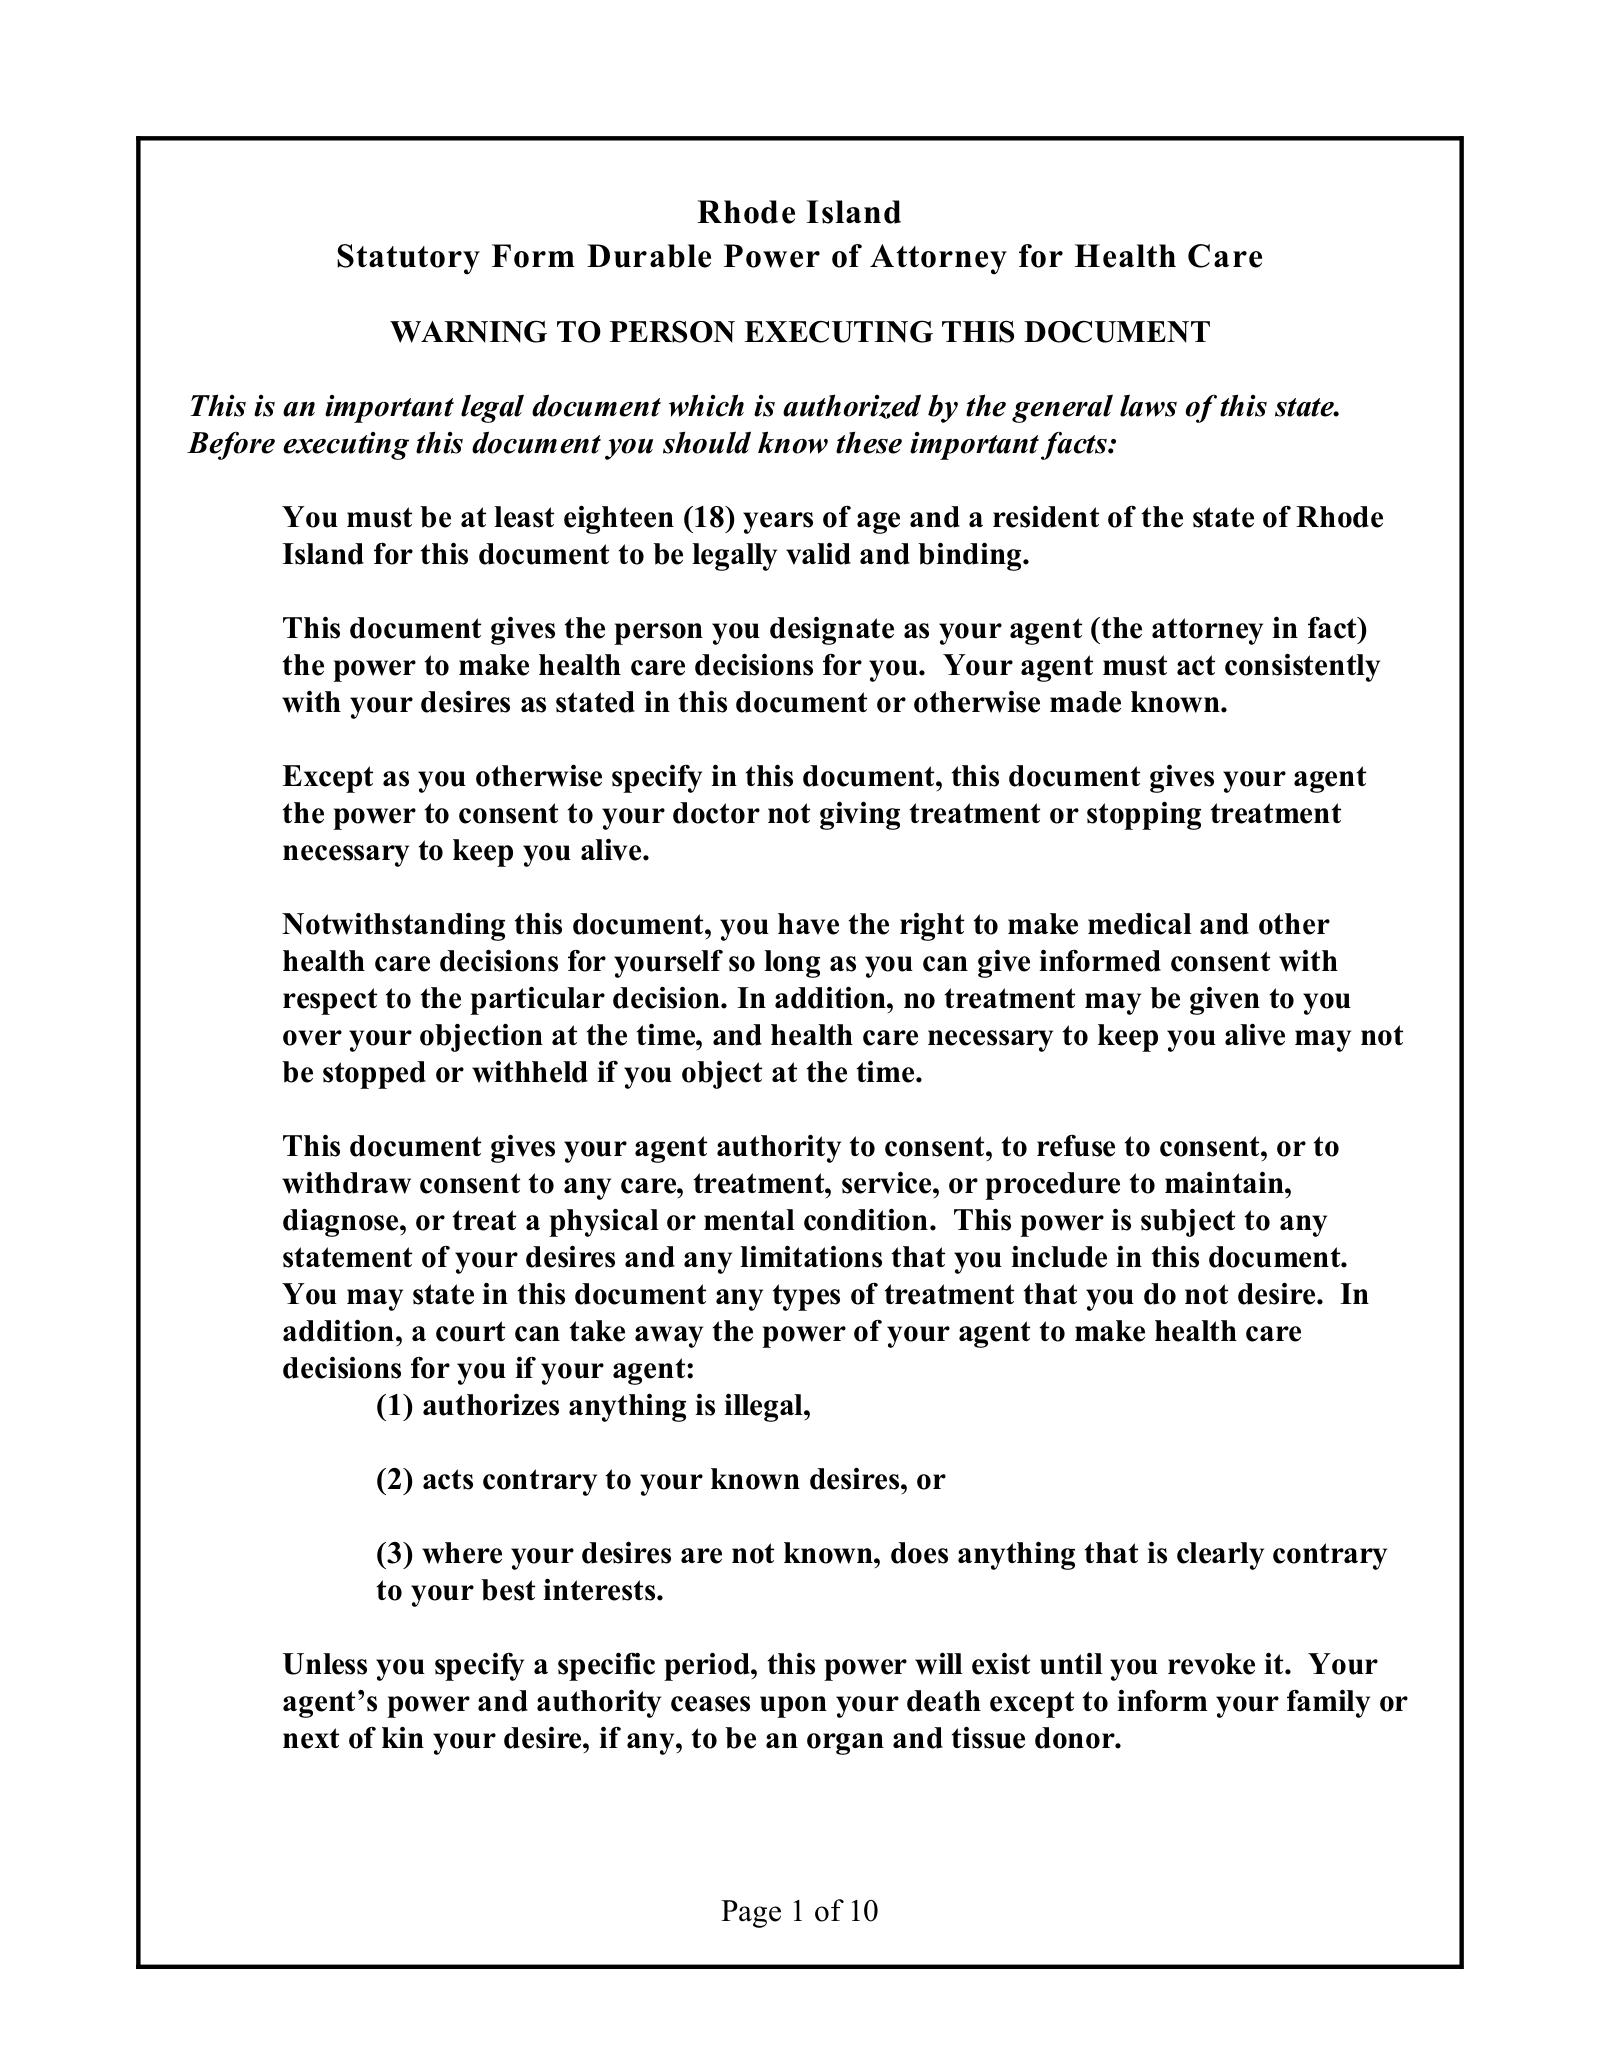 Free Rhode Island Advance Directive (Health Care) Power of